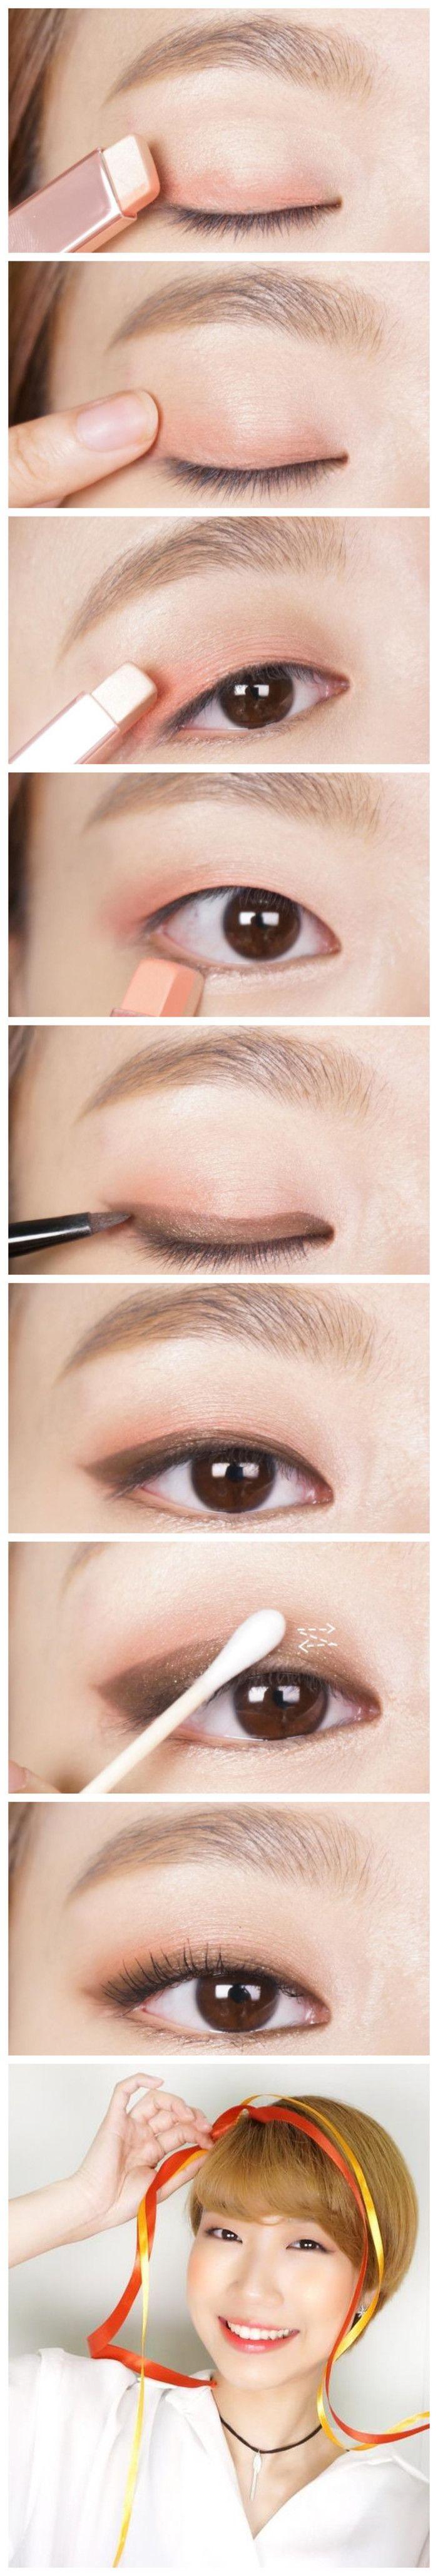 Single eyelid make up eye make up idea makeup asian style eye makeup single eyelid make up make up ten different ways of eye makeup baditri Gallery